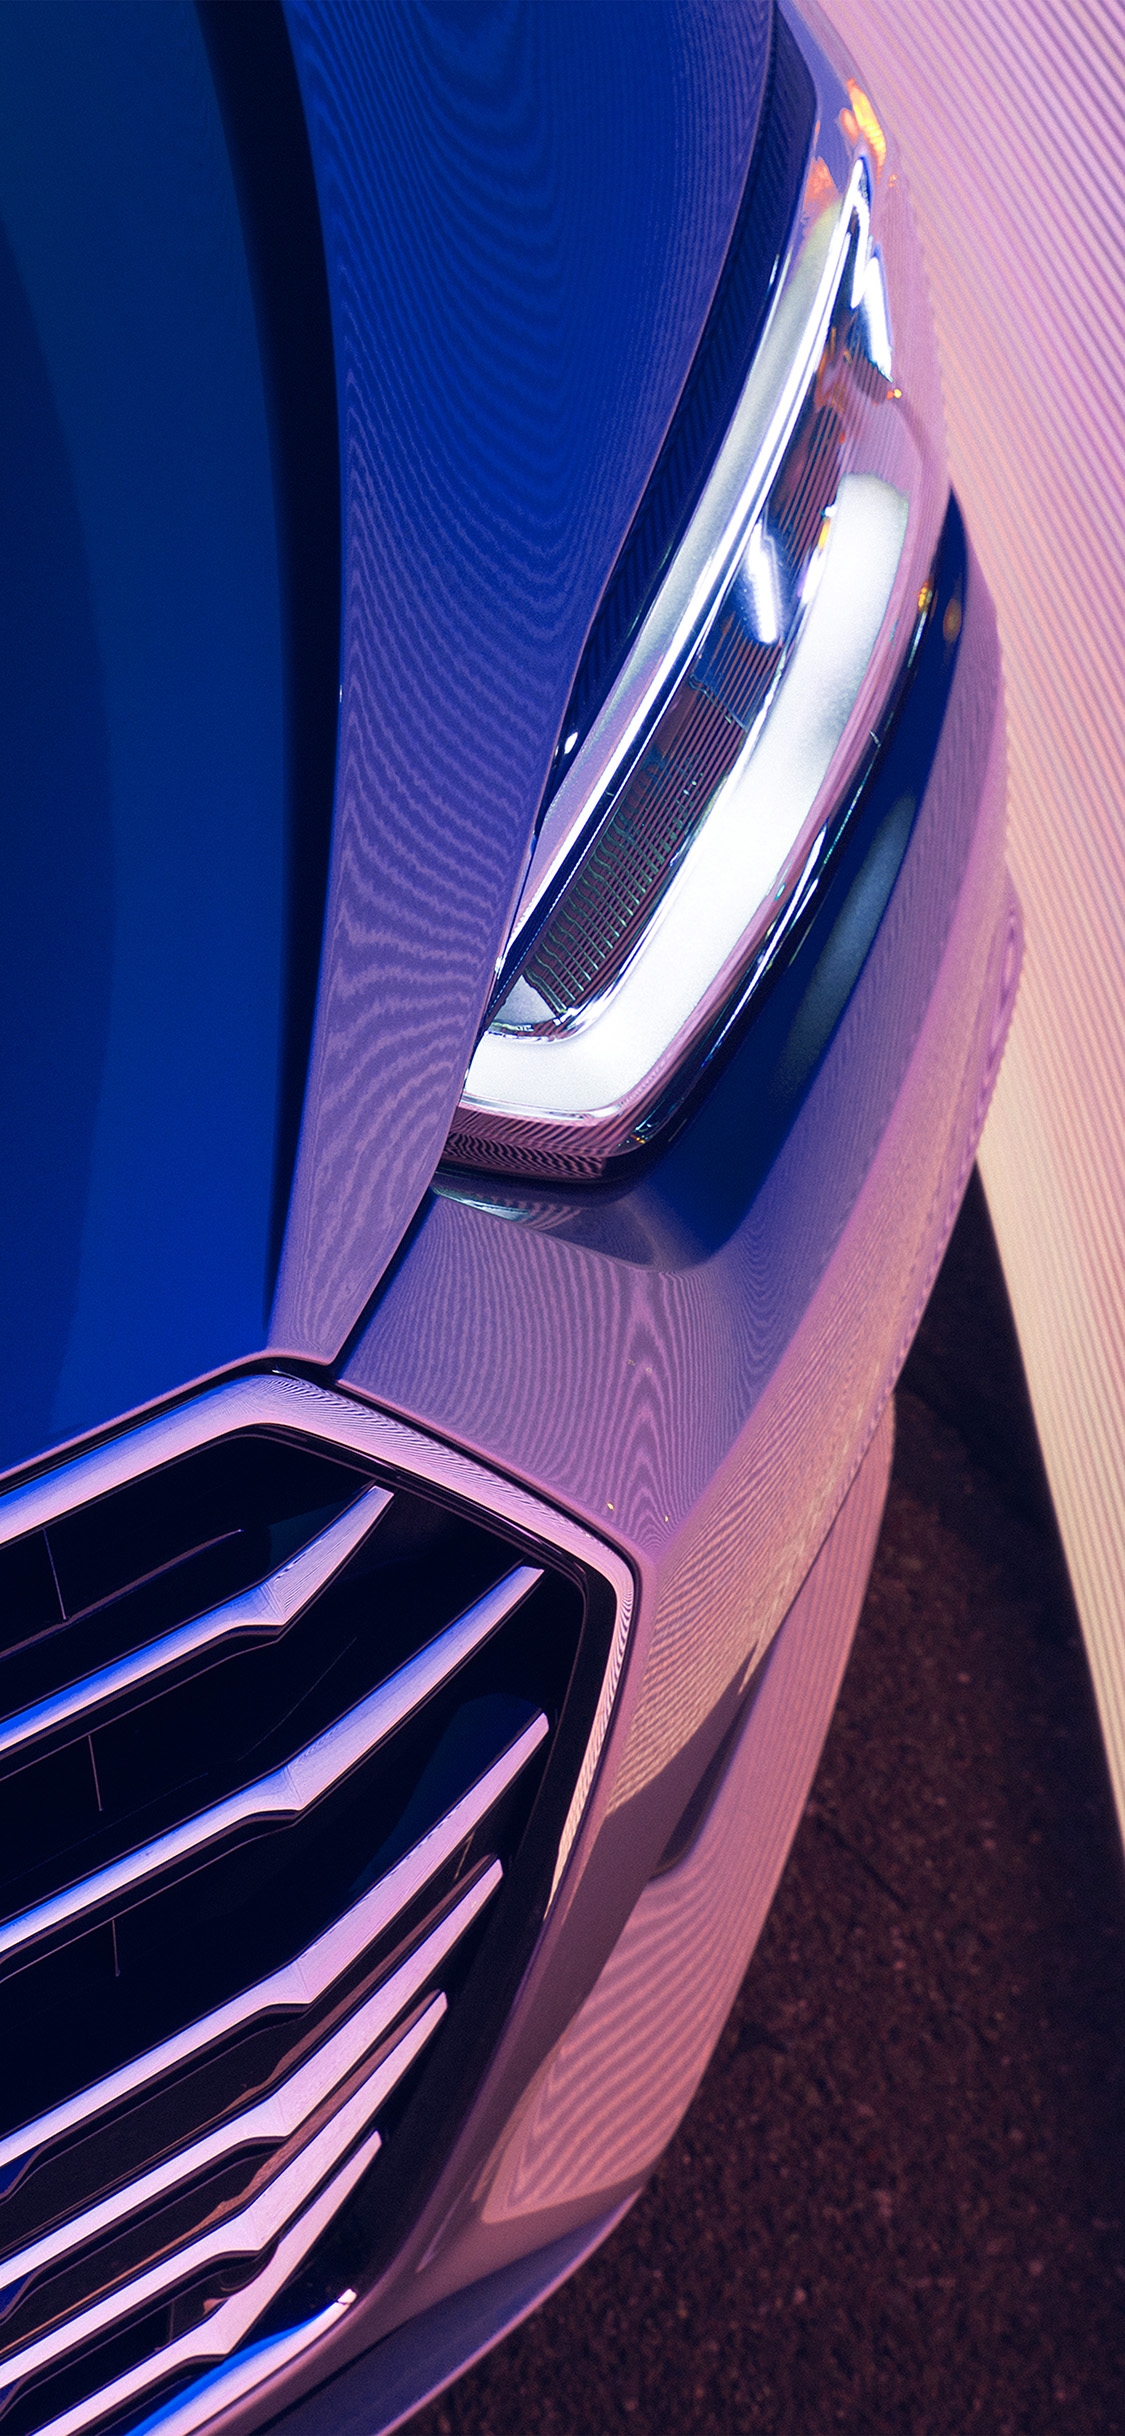 iPhonexpapers.com-Apple-iPhone-wallpaper-be71-car-headlight-audi-art-illustration-blue-pink